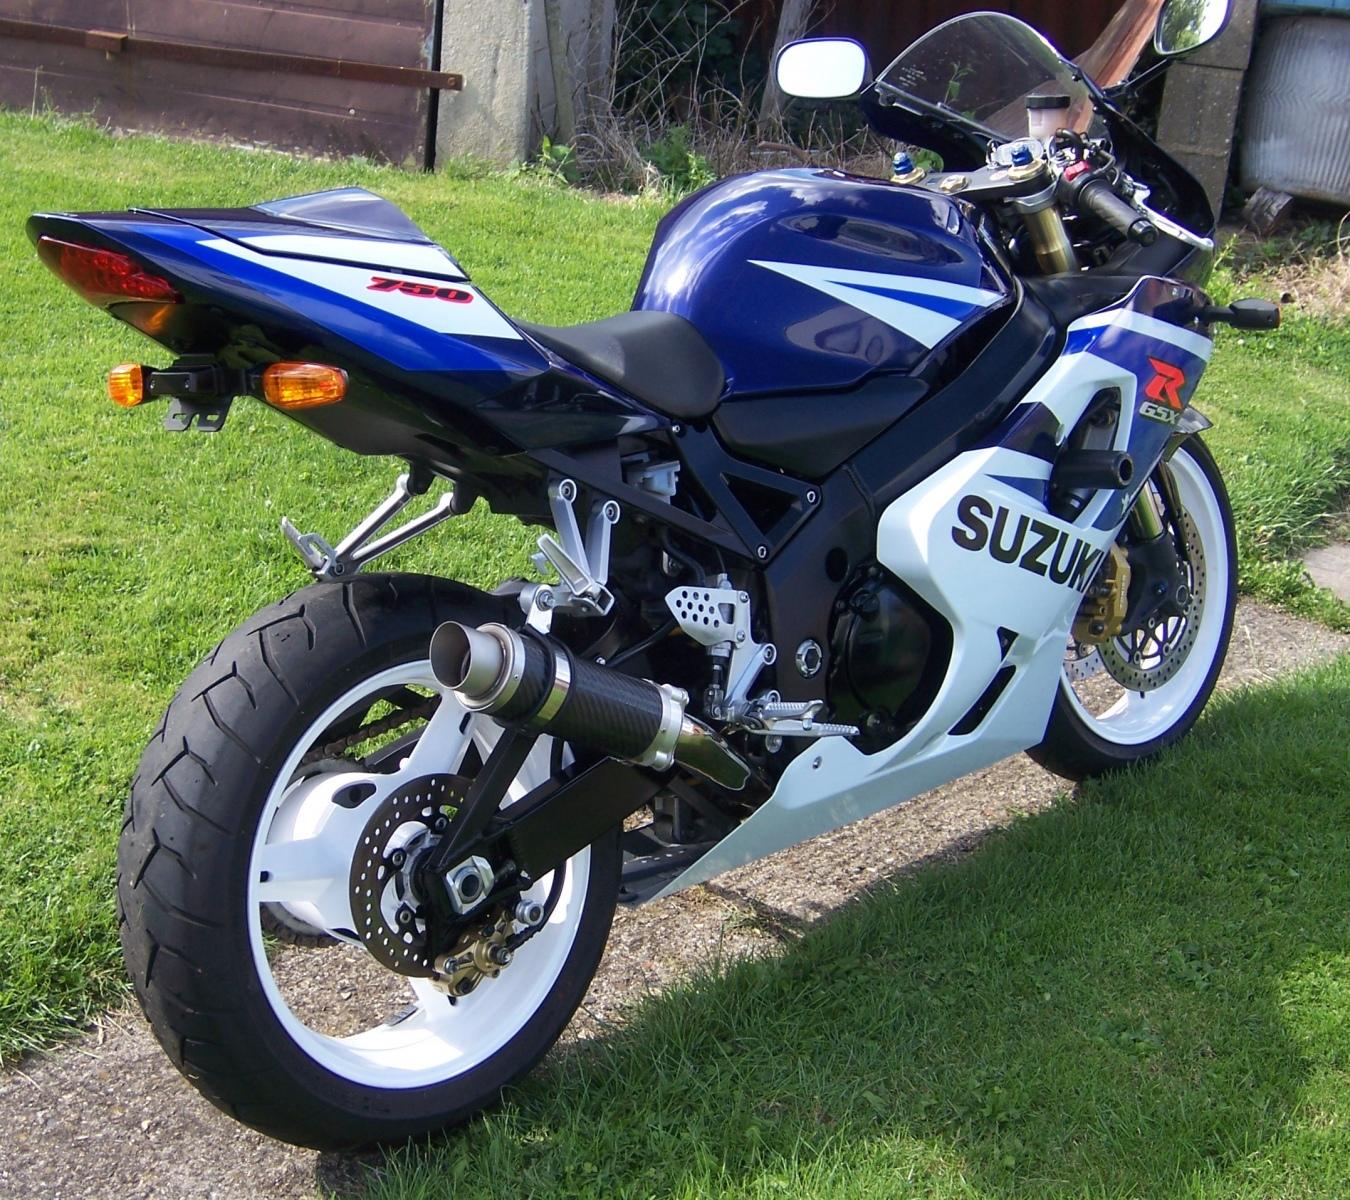 "Suzuki GSXR 600 750 K1-K5 2001-2005<p>A16 Moto GP Carbon Exhaust with Titanium Type Slashcut Outlet</p><br><a href=""https://a16roadnracesupplies.co.uk/product/a16-suzuki-exhausts/"">Buy now!</a>"